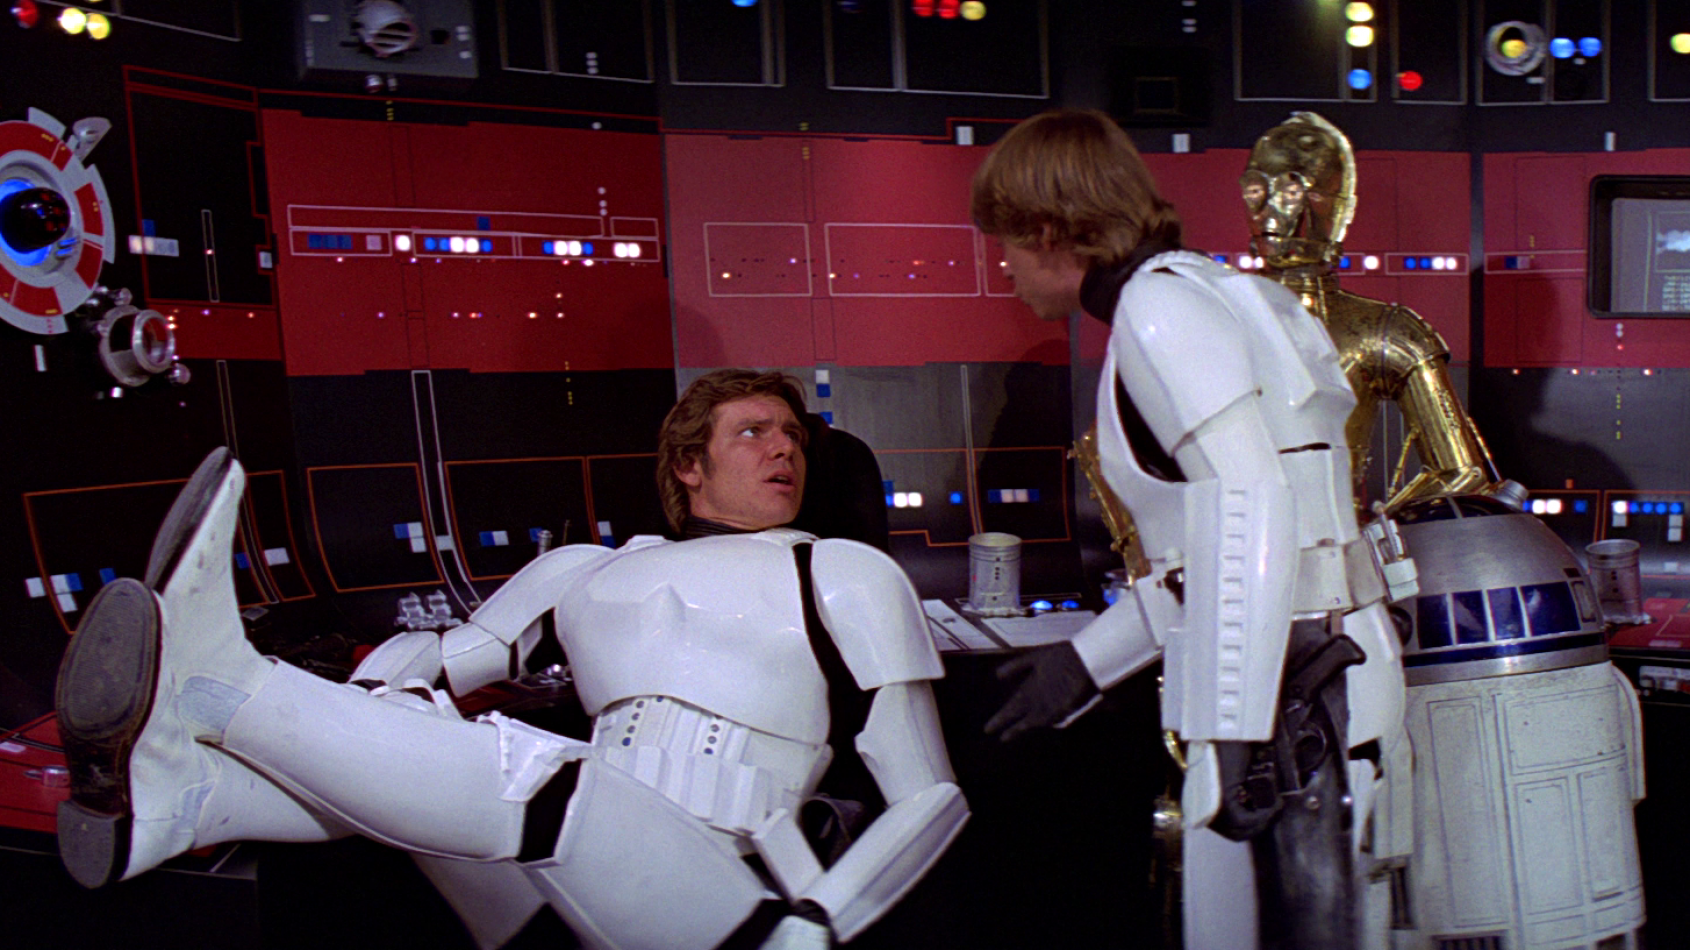 Luke et Han en Stormtroopers dans la gamme Elite Series